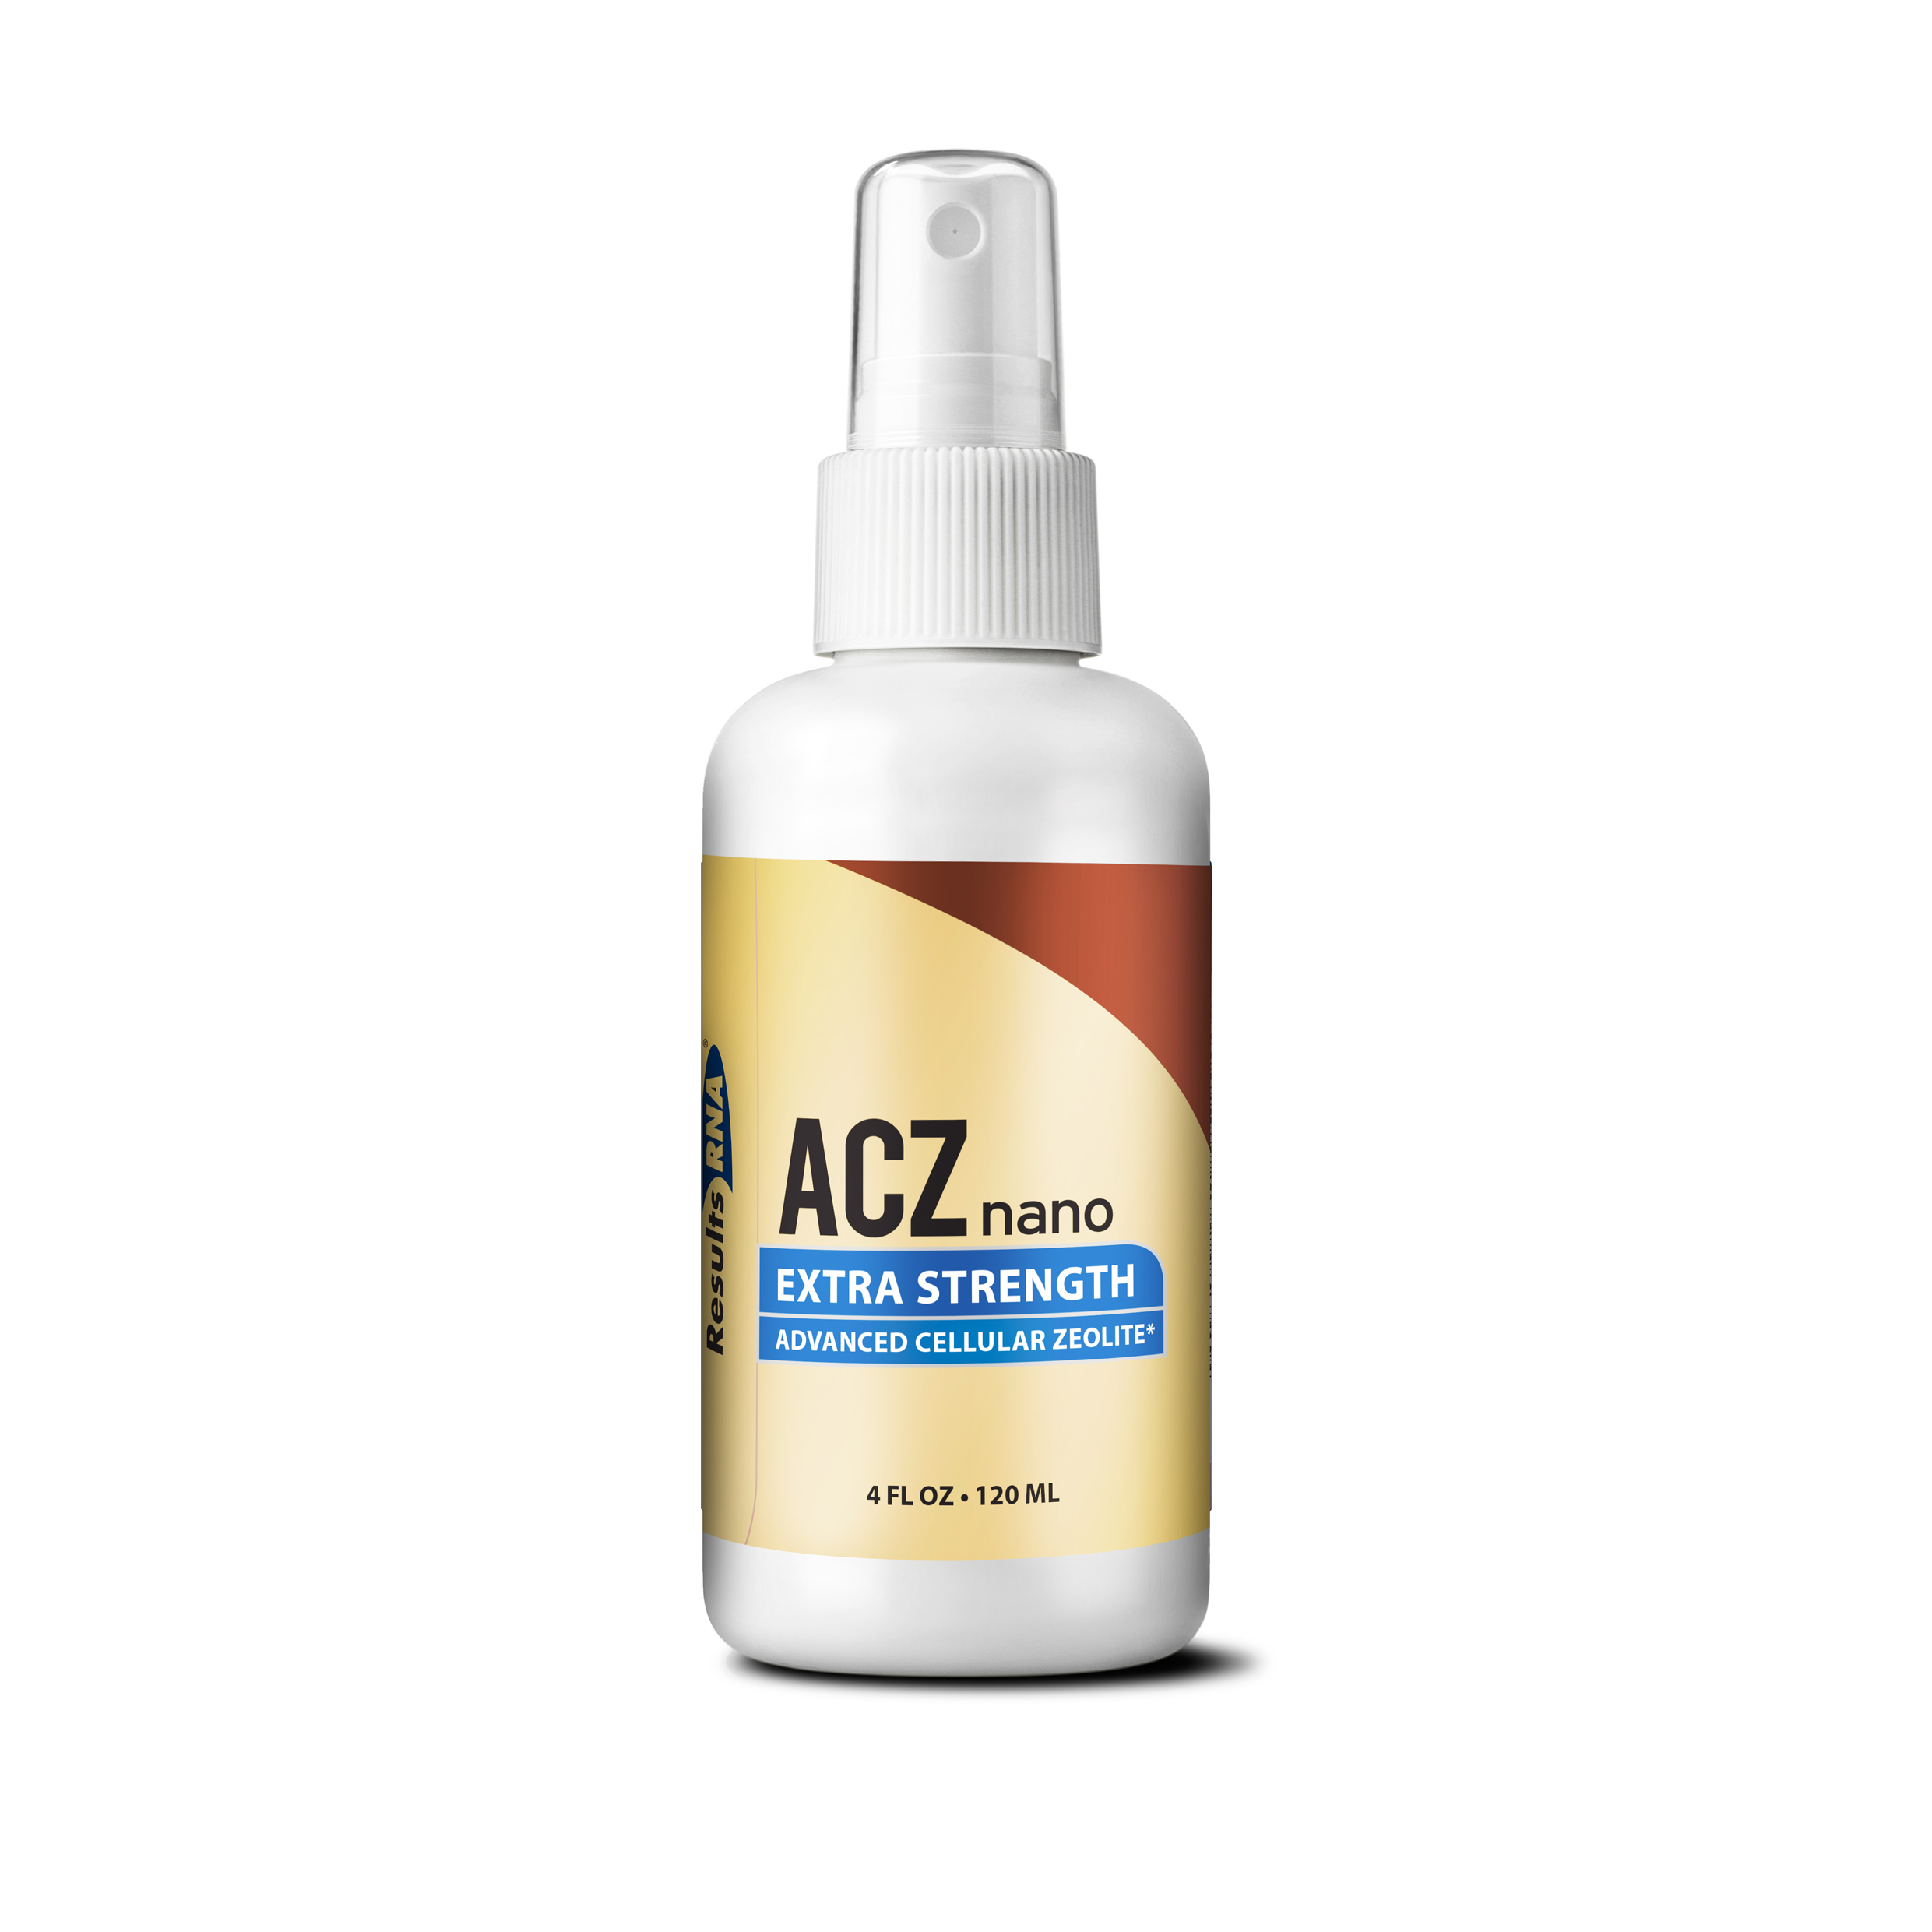 Advanced Cellular Zeolite (ACZ) nano Extra Strength 120ml